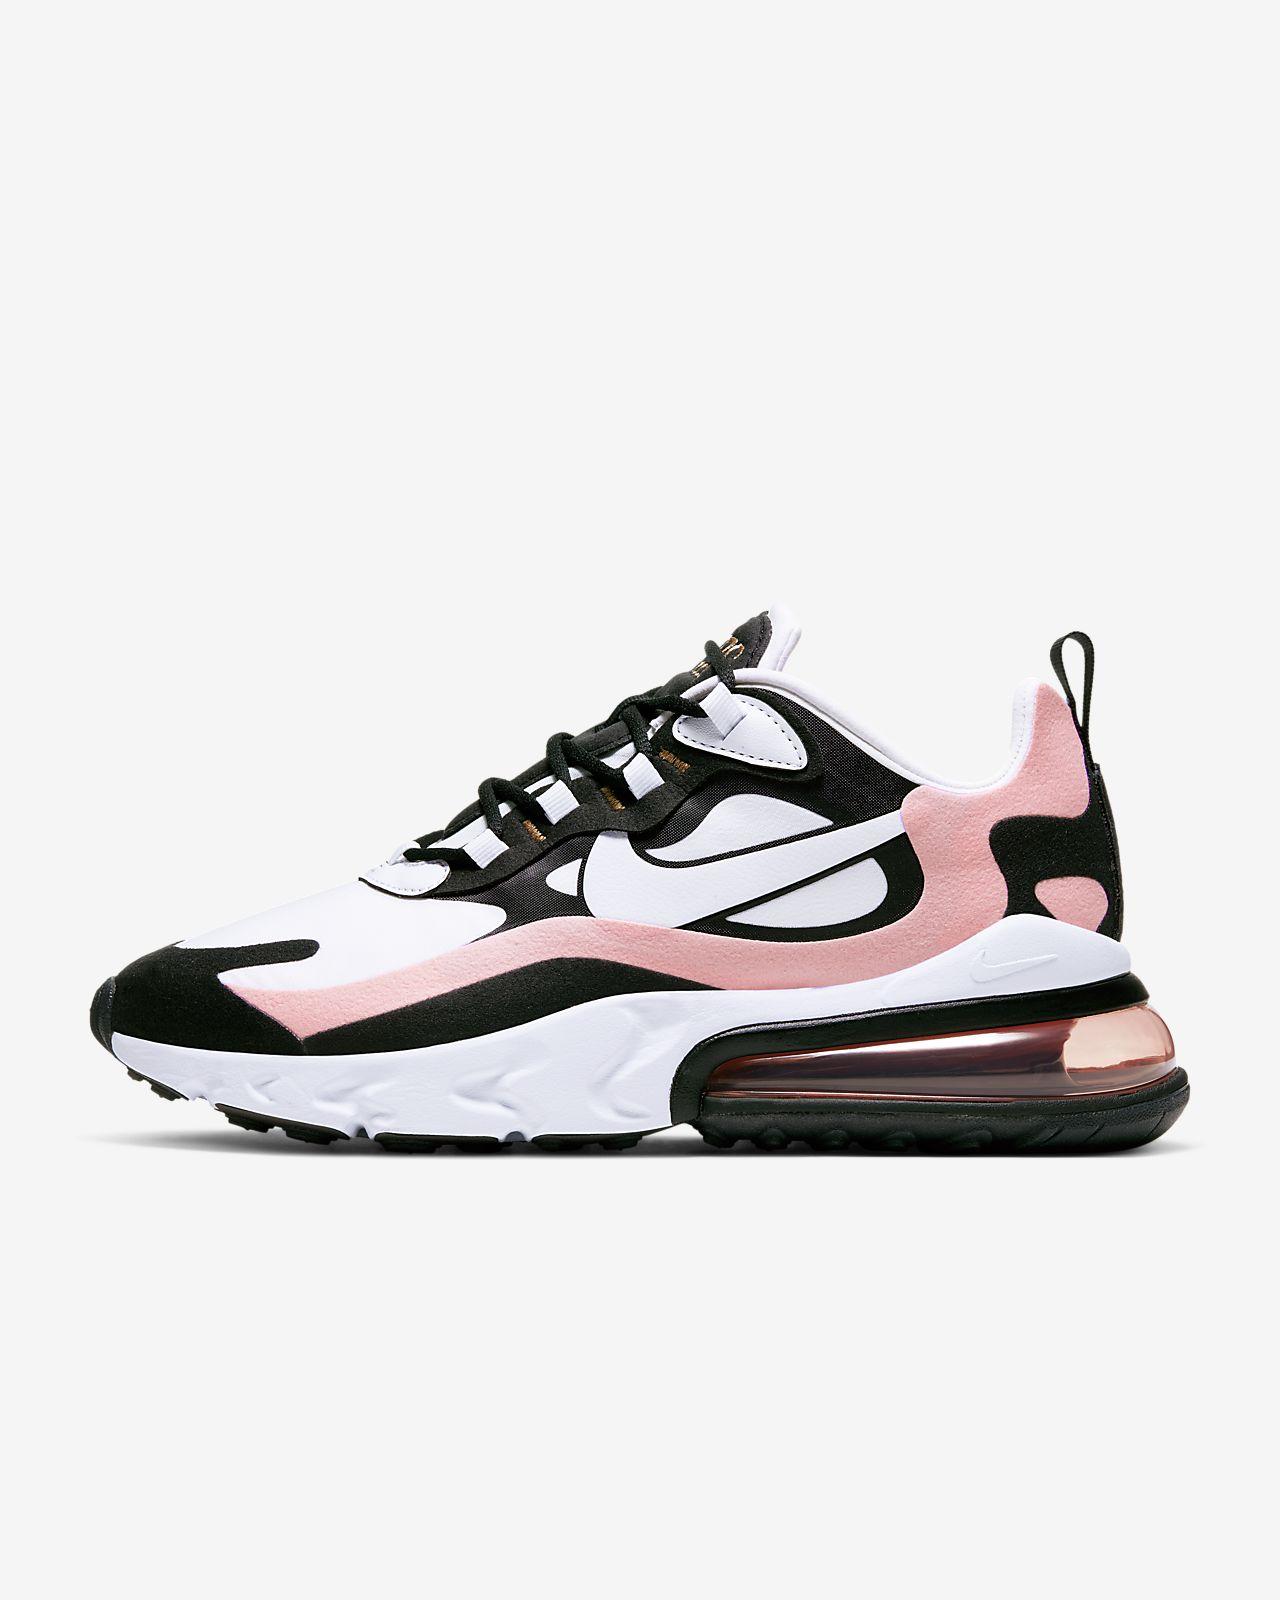 Nike Air Max 270 React Damen Schuh Schuhe Schuhe Running